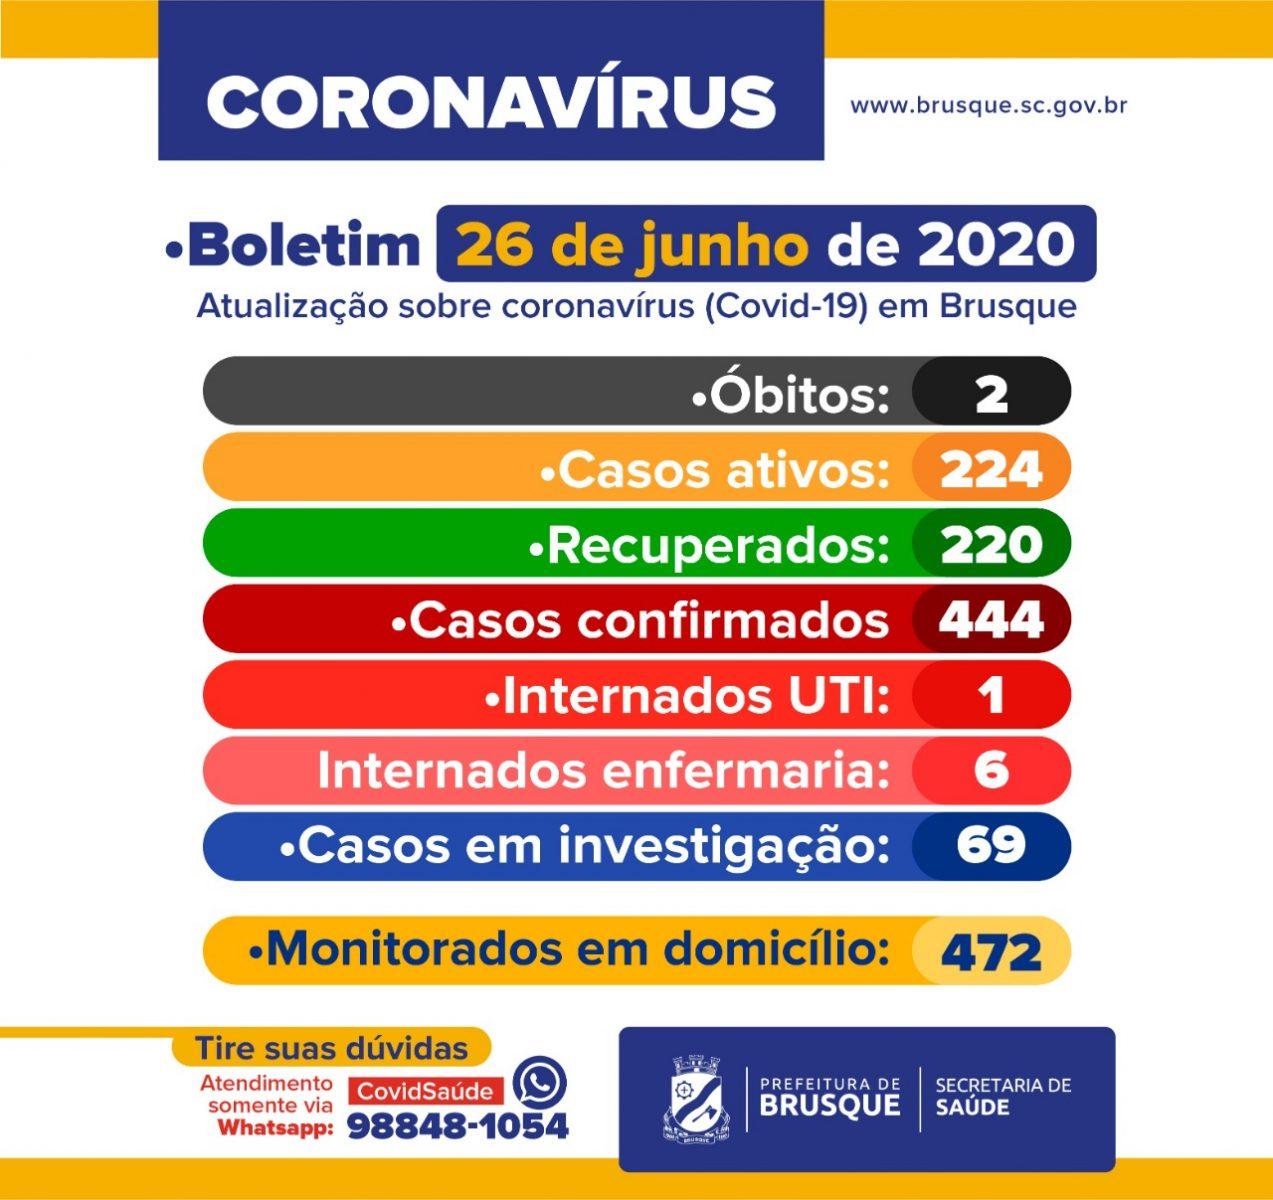 Confira o Boletim Epidemiológico da Prefeitura de Brusque desta sexta-feira (26)